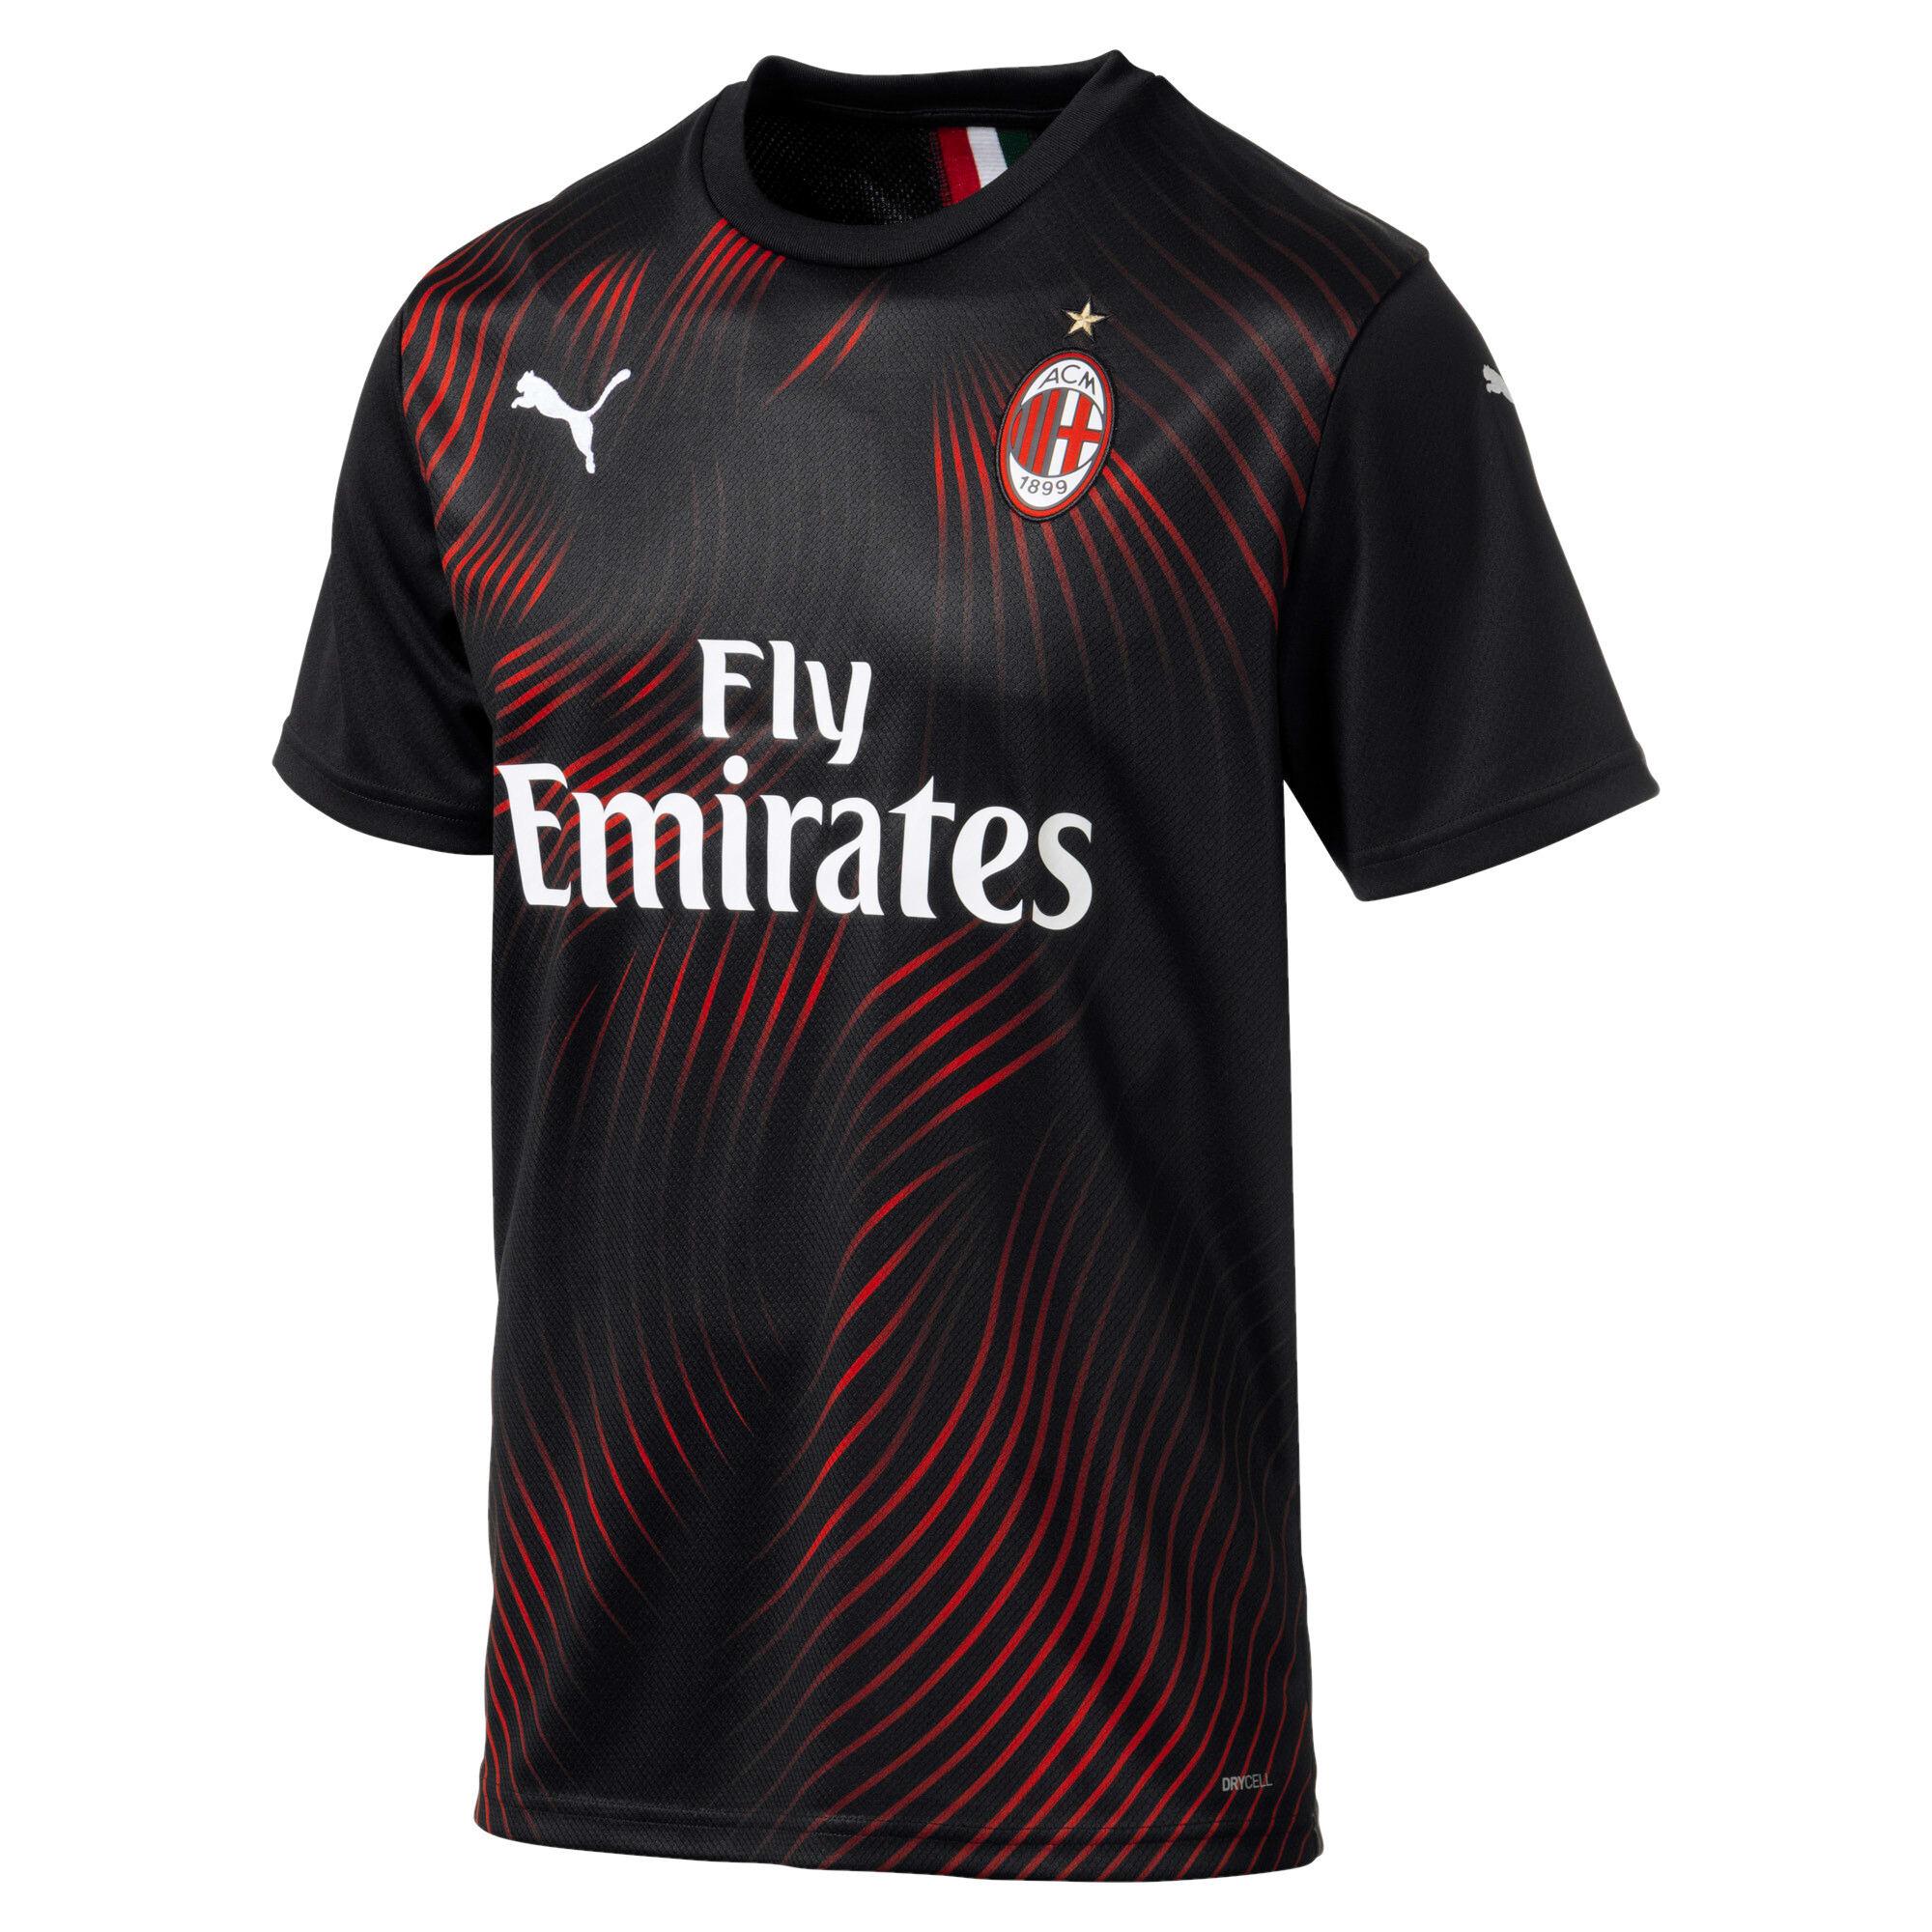 Thumbnail 1 of AC Milan Herren Replica Ausweichtrikot, Puma Black-Tango Red, medium